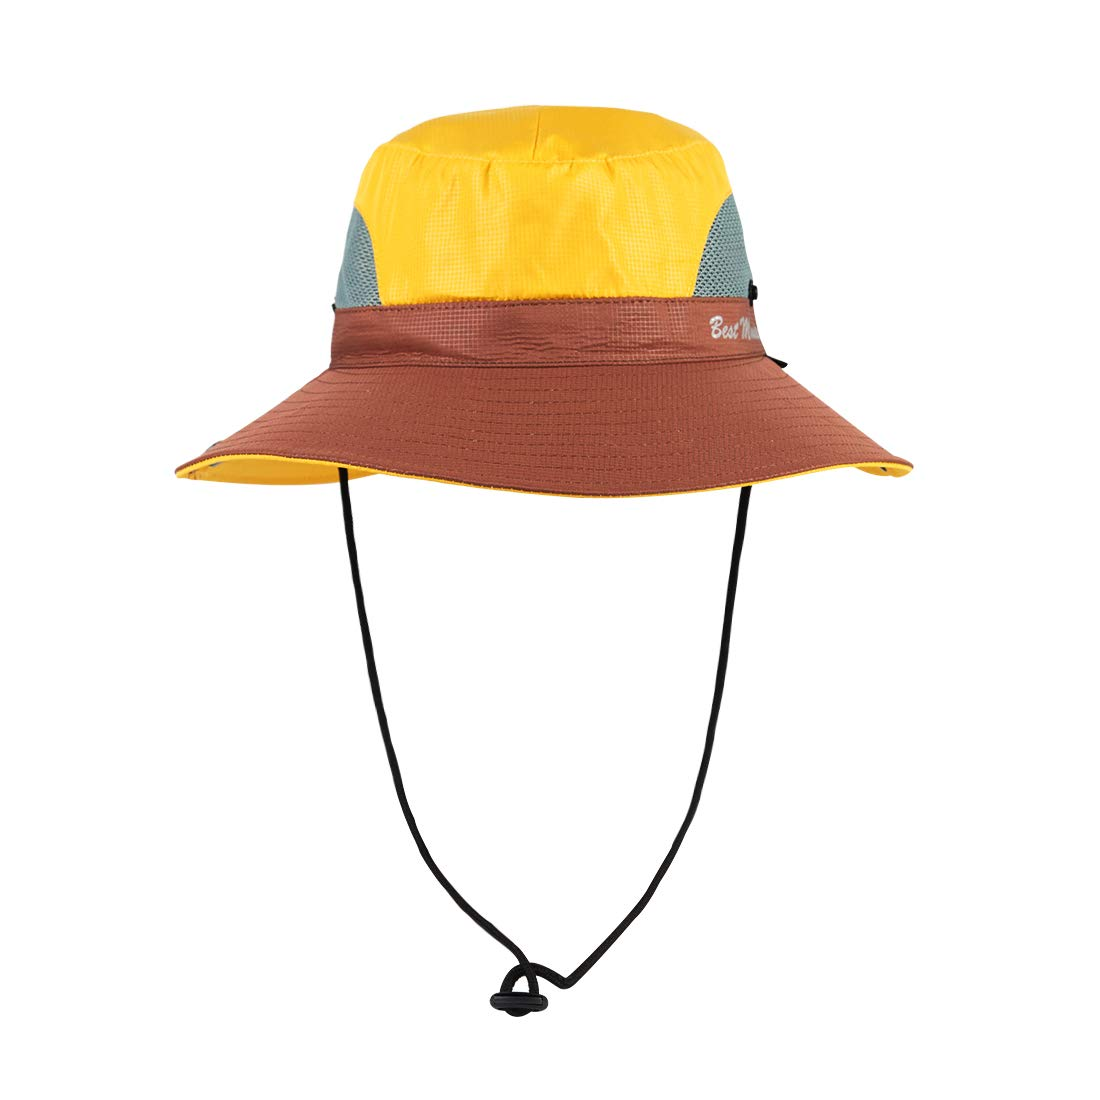 SIYWINA Herren Sonnenhut Safari Hut UV Schutz Sommer Outdoor Faltbar Fischerhut